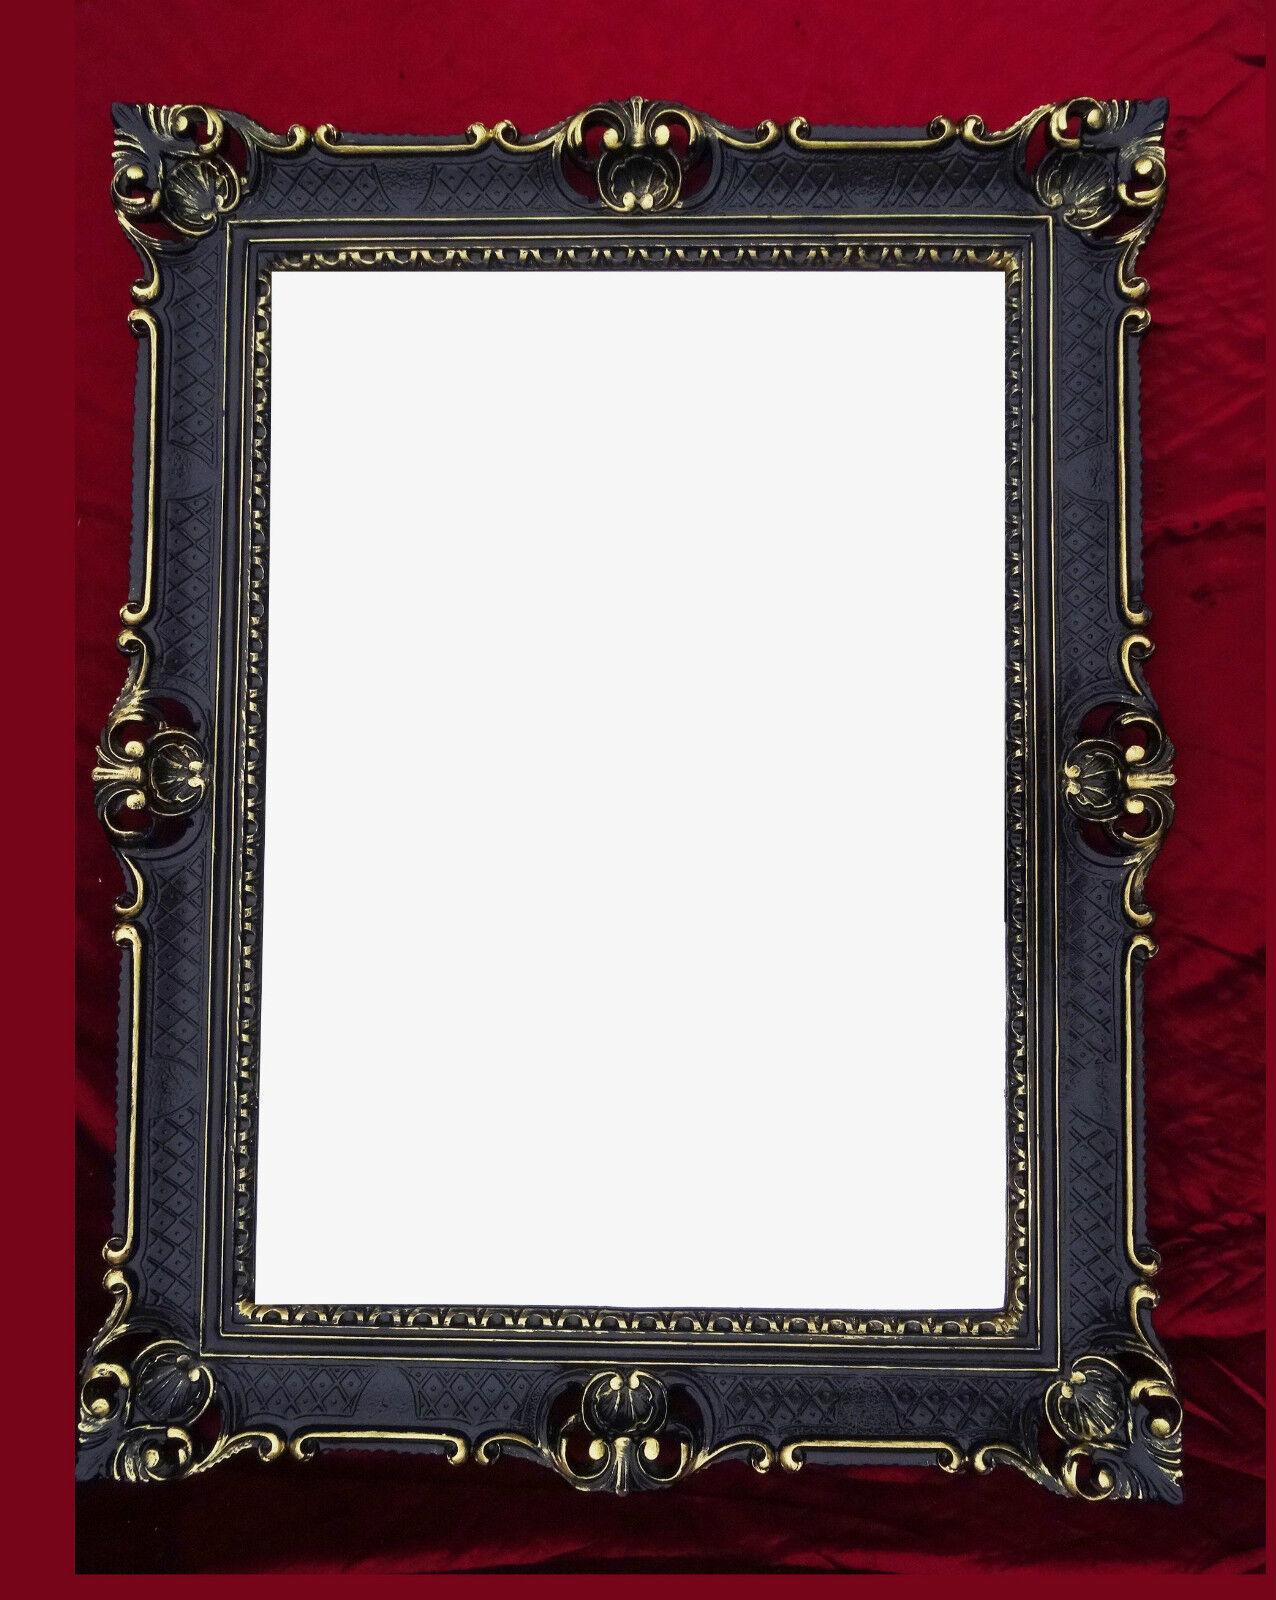 Bilderrahmen Fotorahmen silber schwarz 10x15 Rokoko Barock Stil Rechteckig Antik